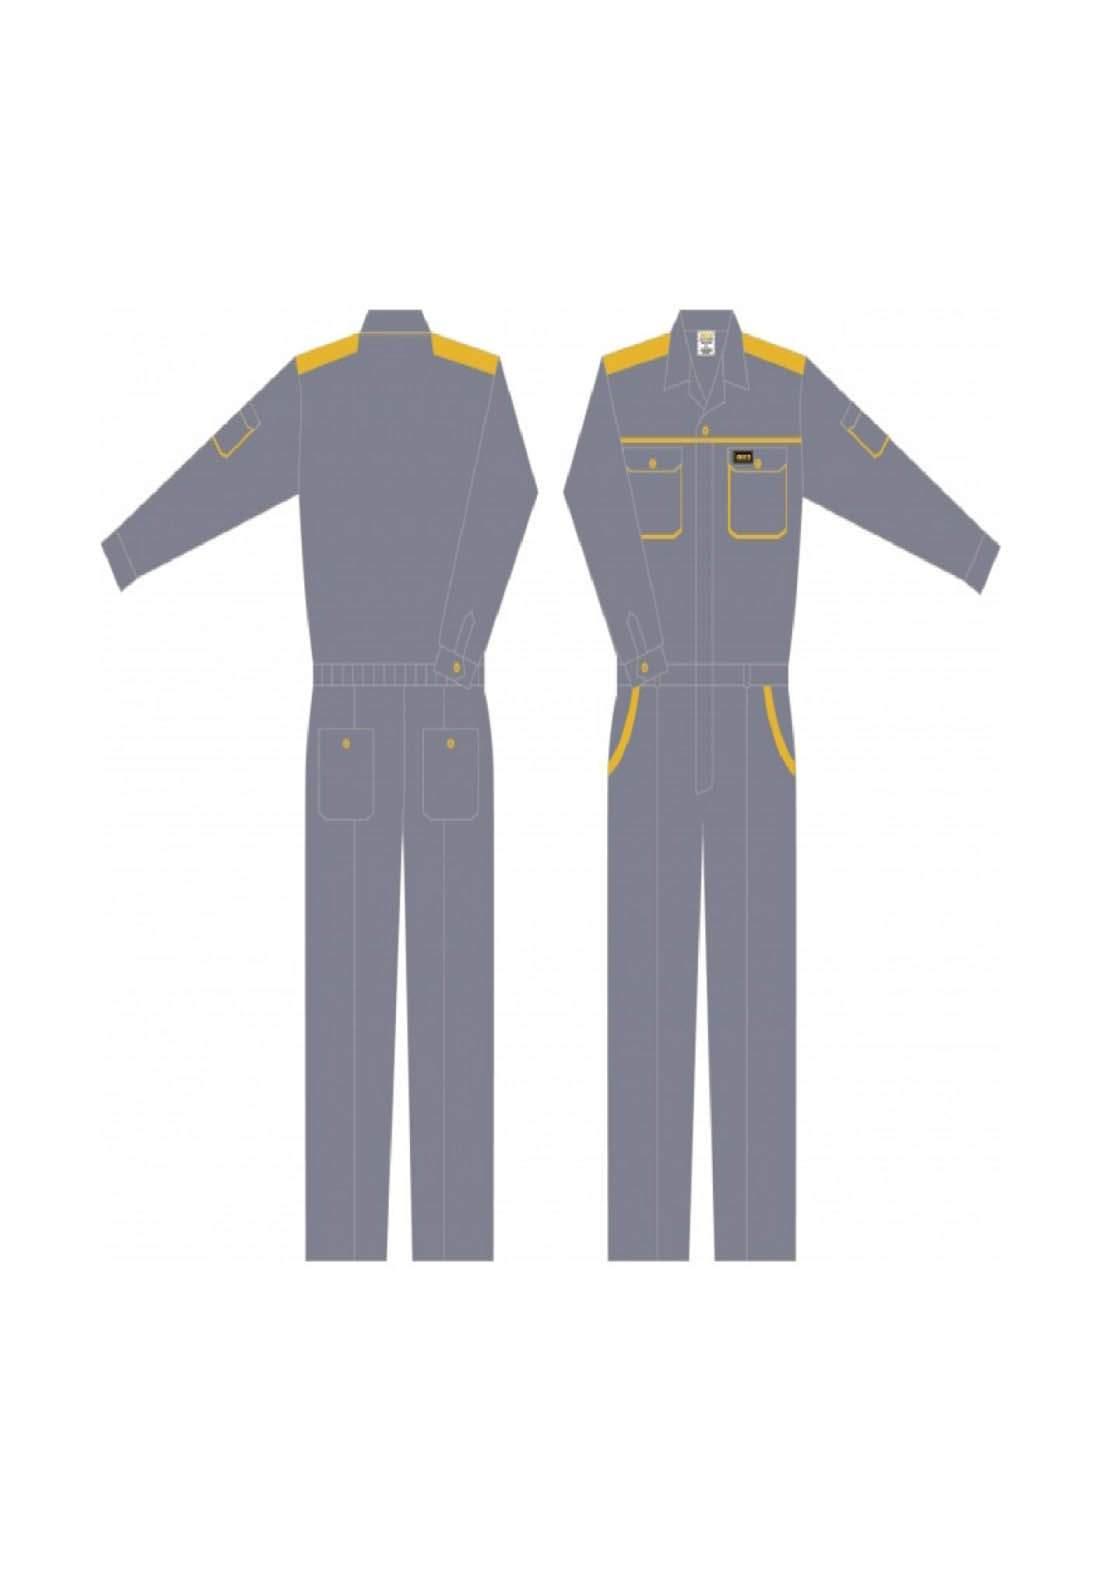 Ingco WUC01150 One piece business suit بدلة عمل